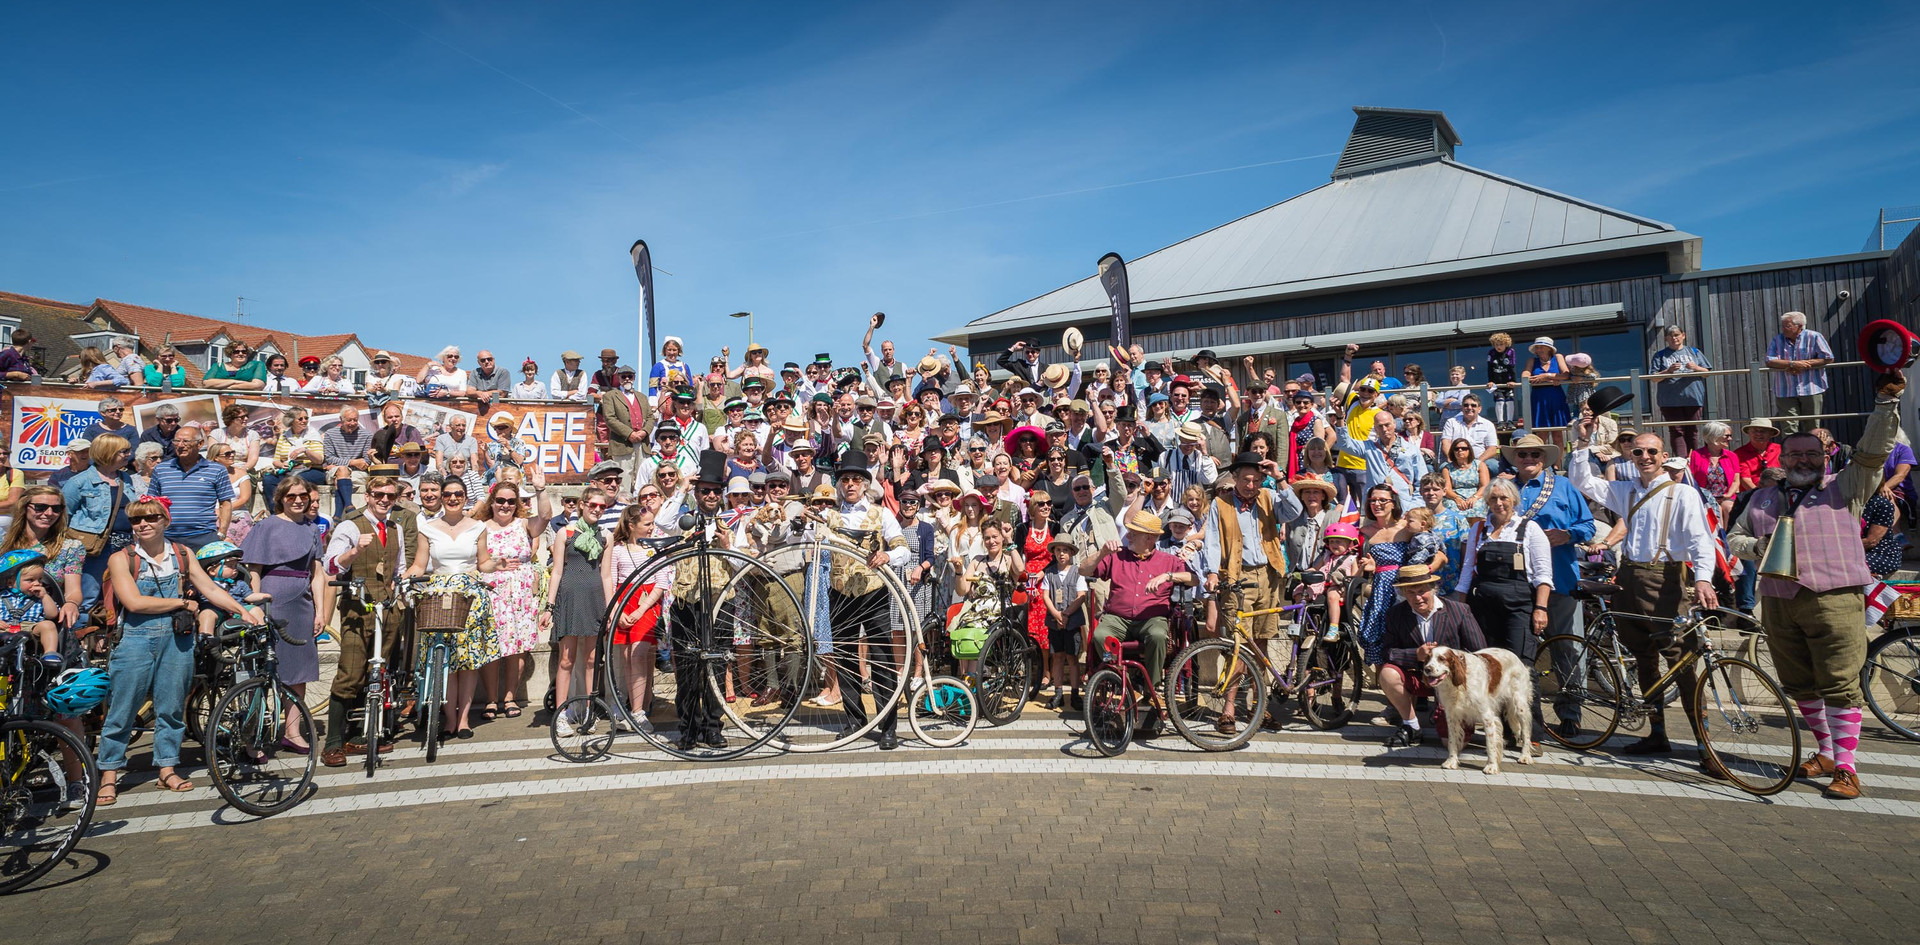 Vintage Cycle Festival